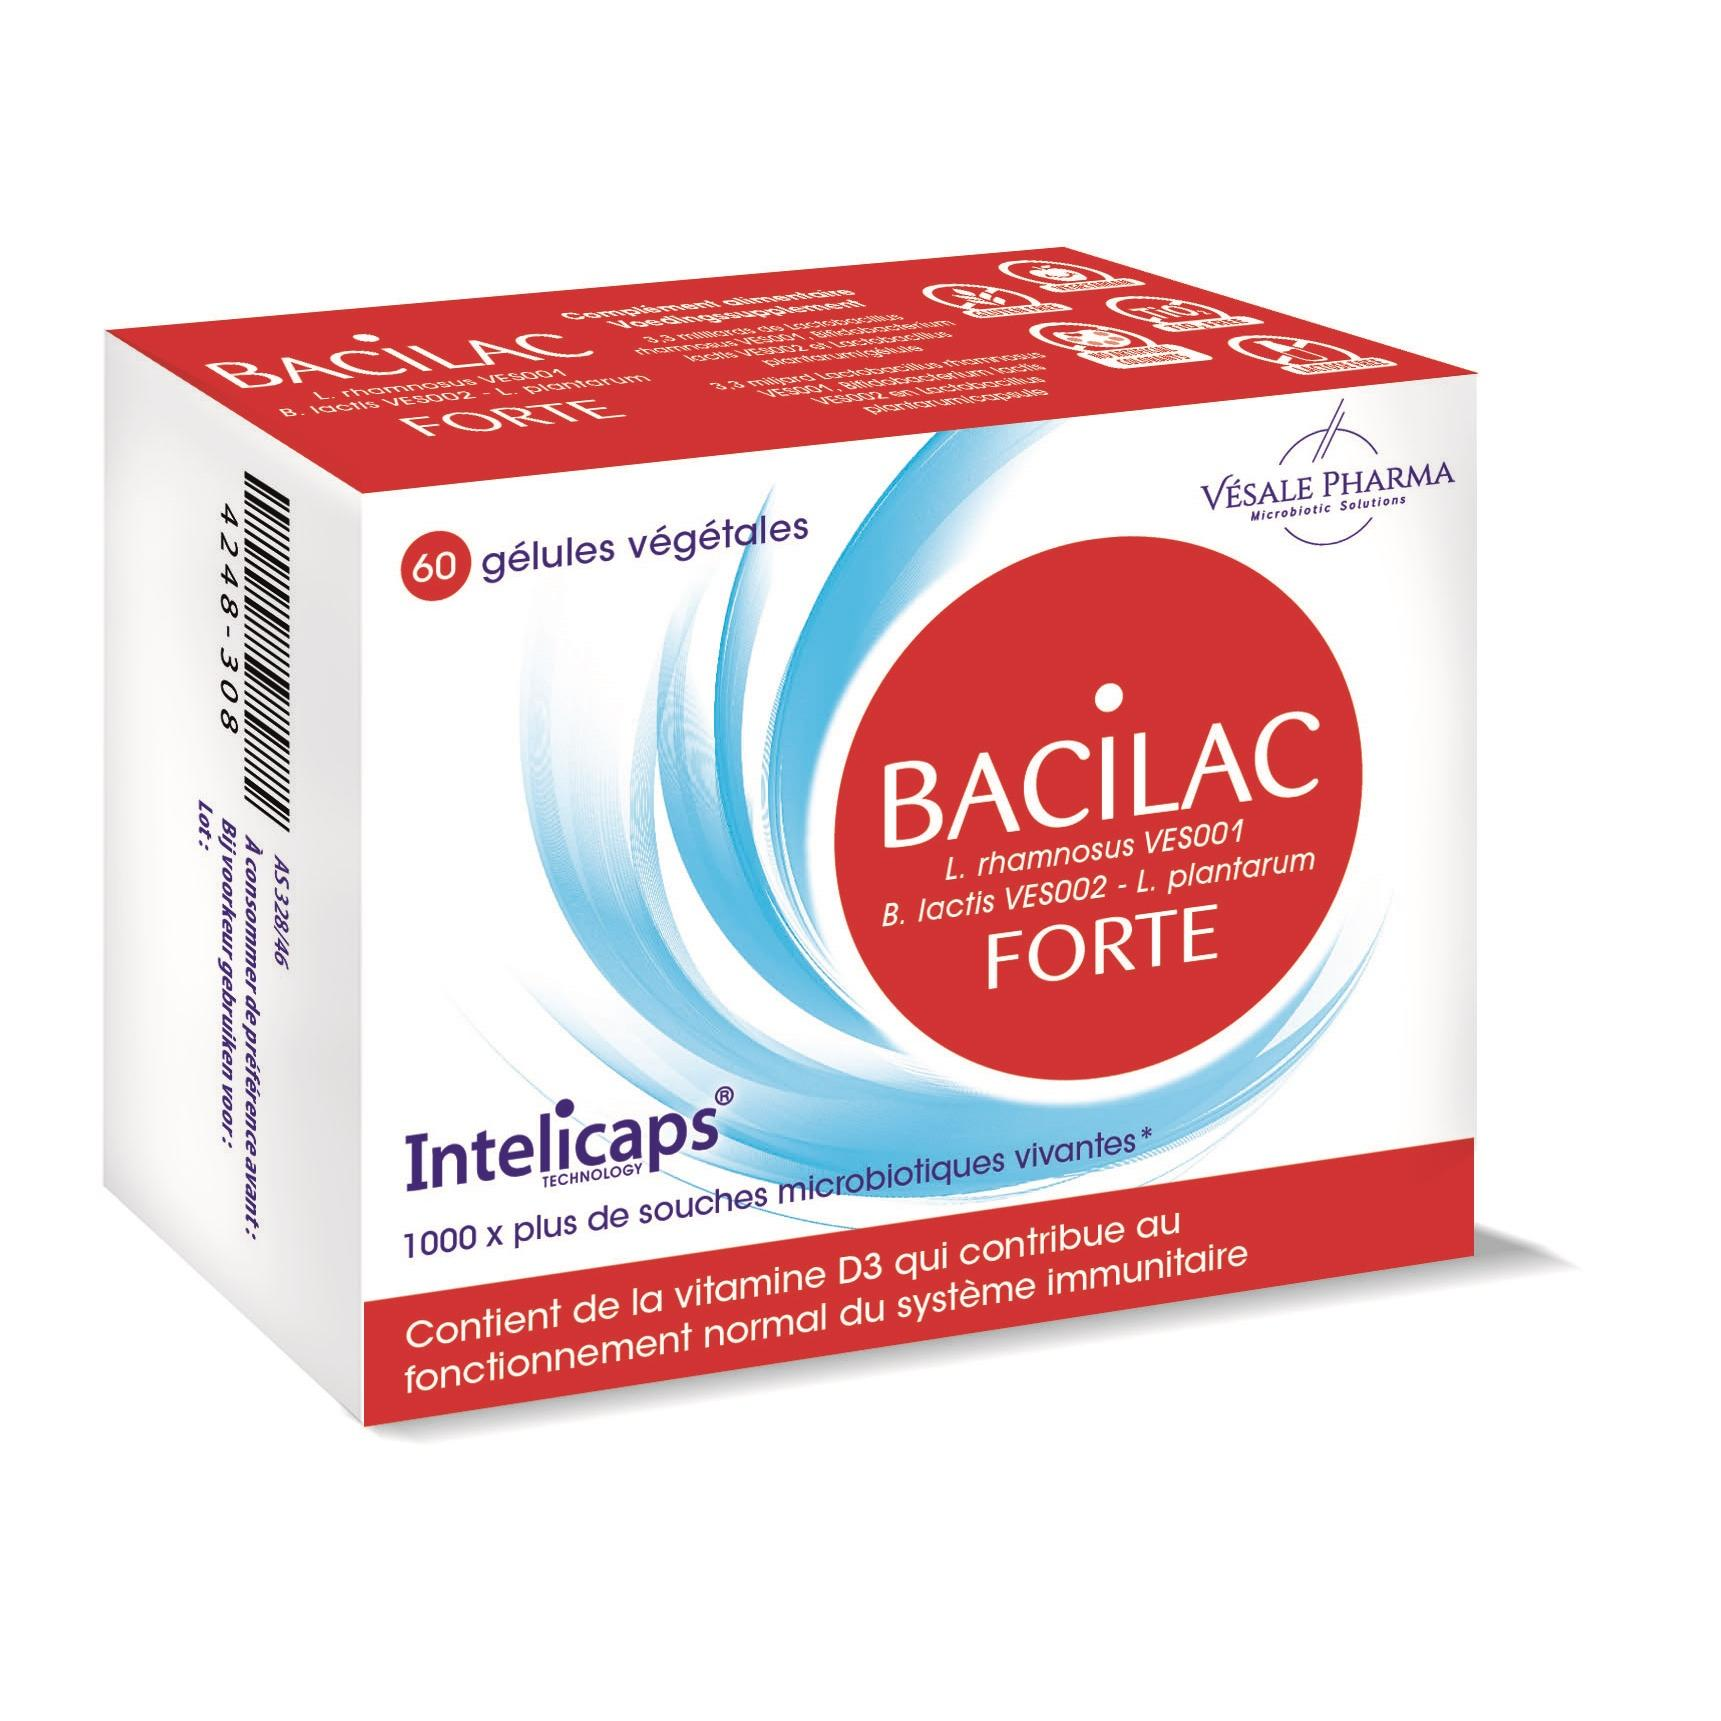 Image of Bacilac Forte Intelicaps